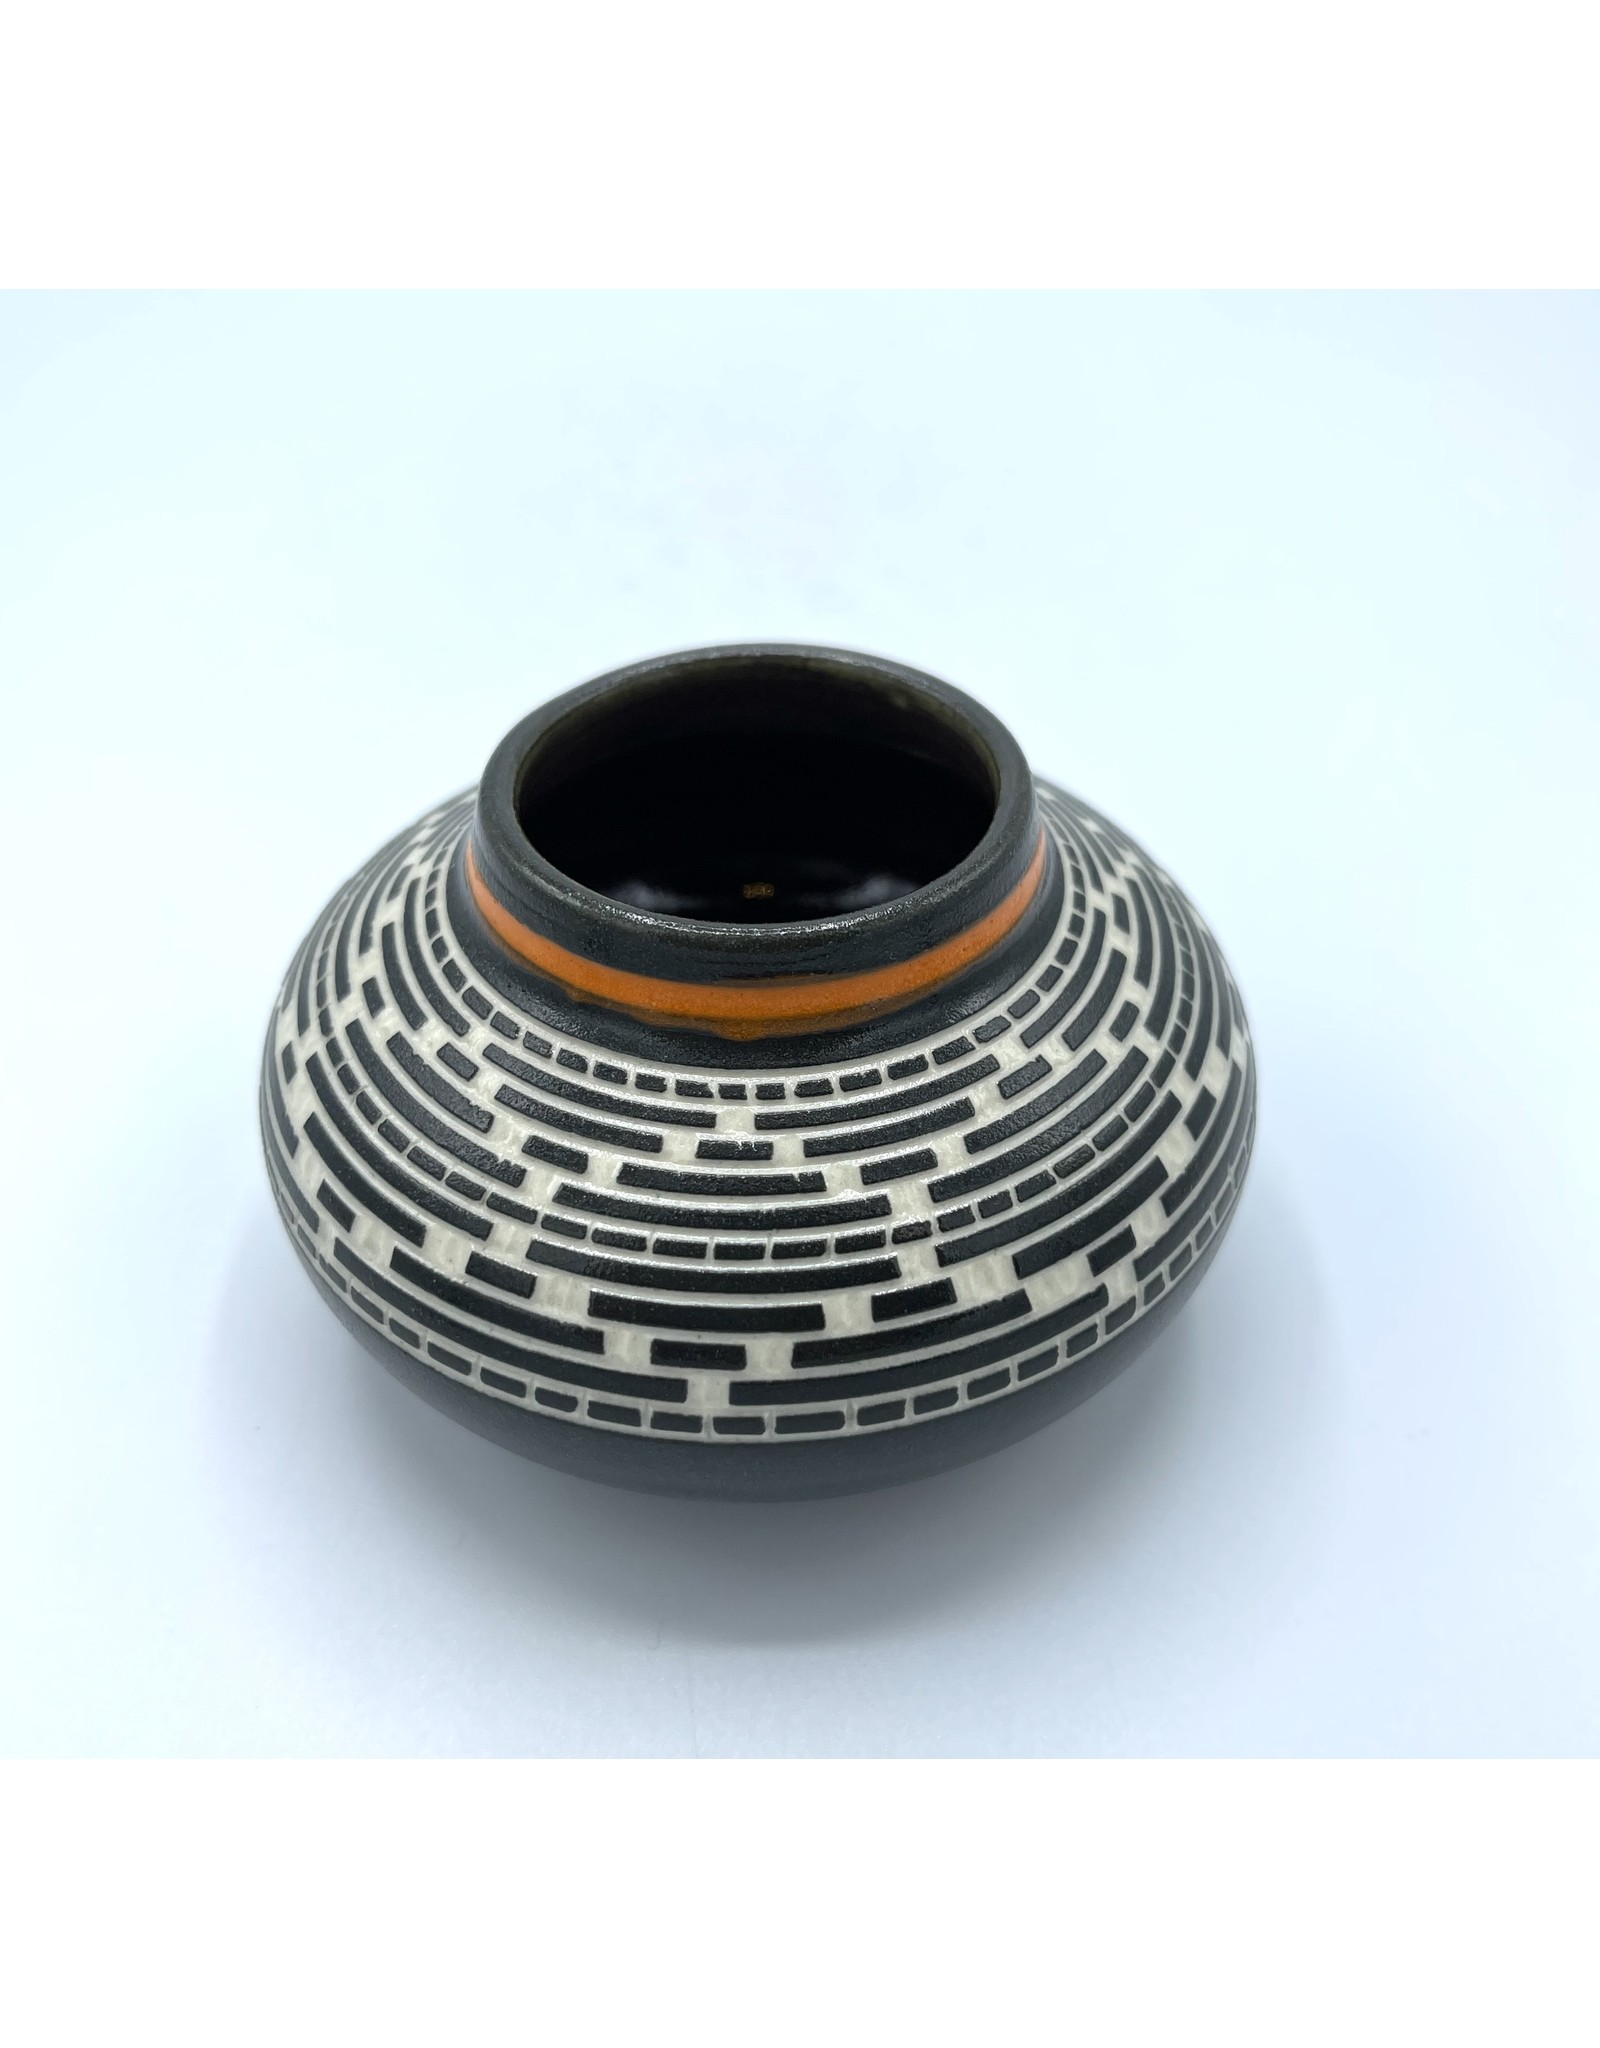 Pottery - #0056